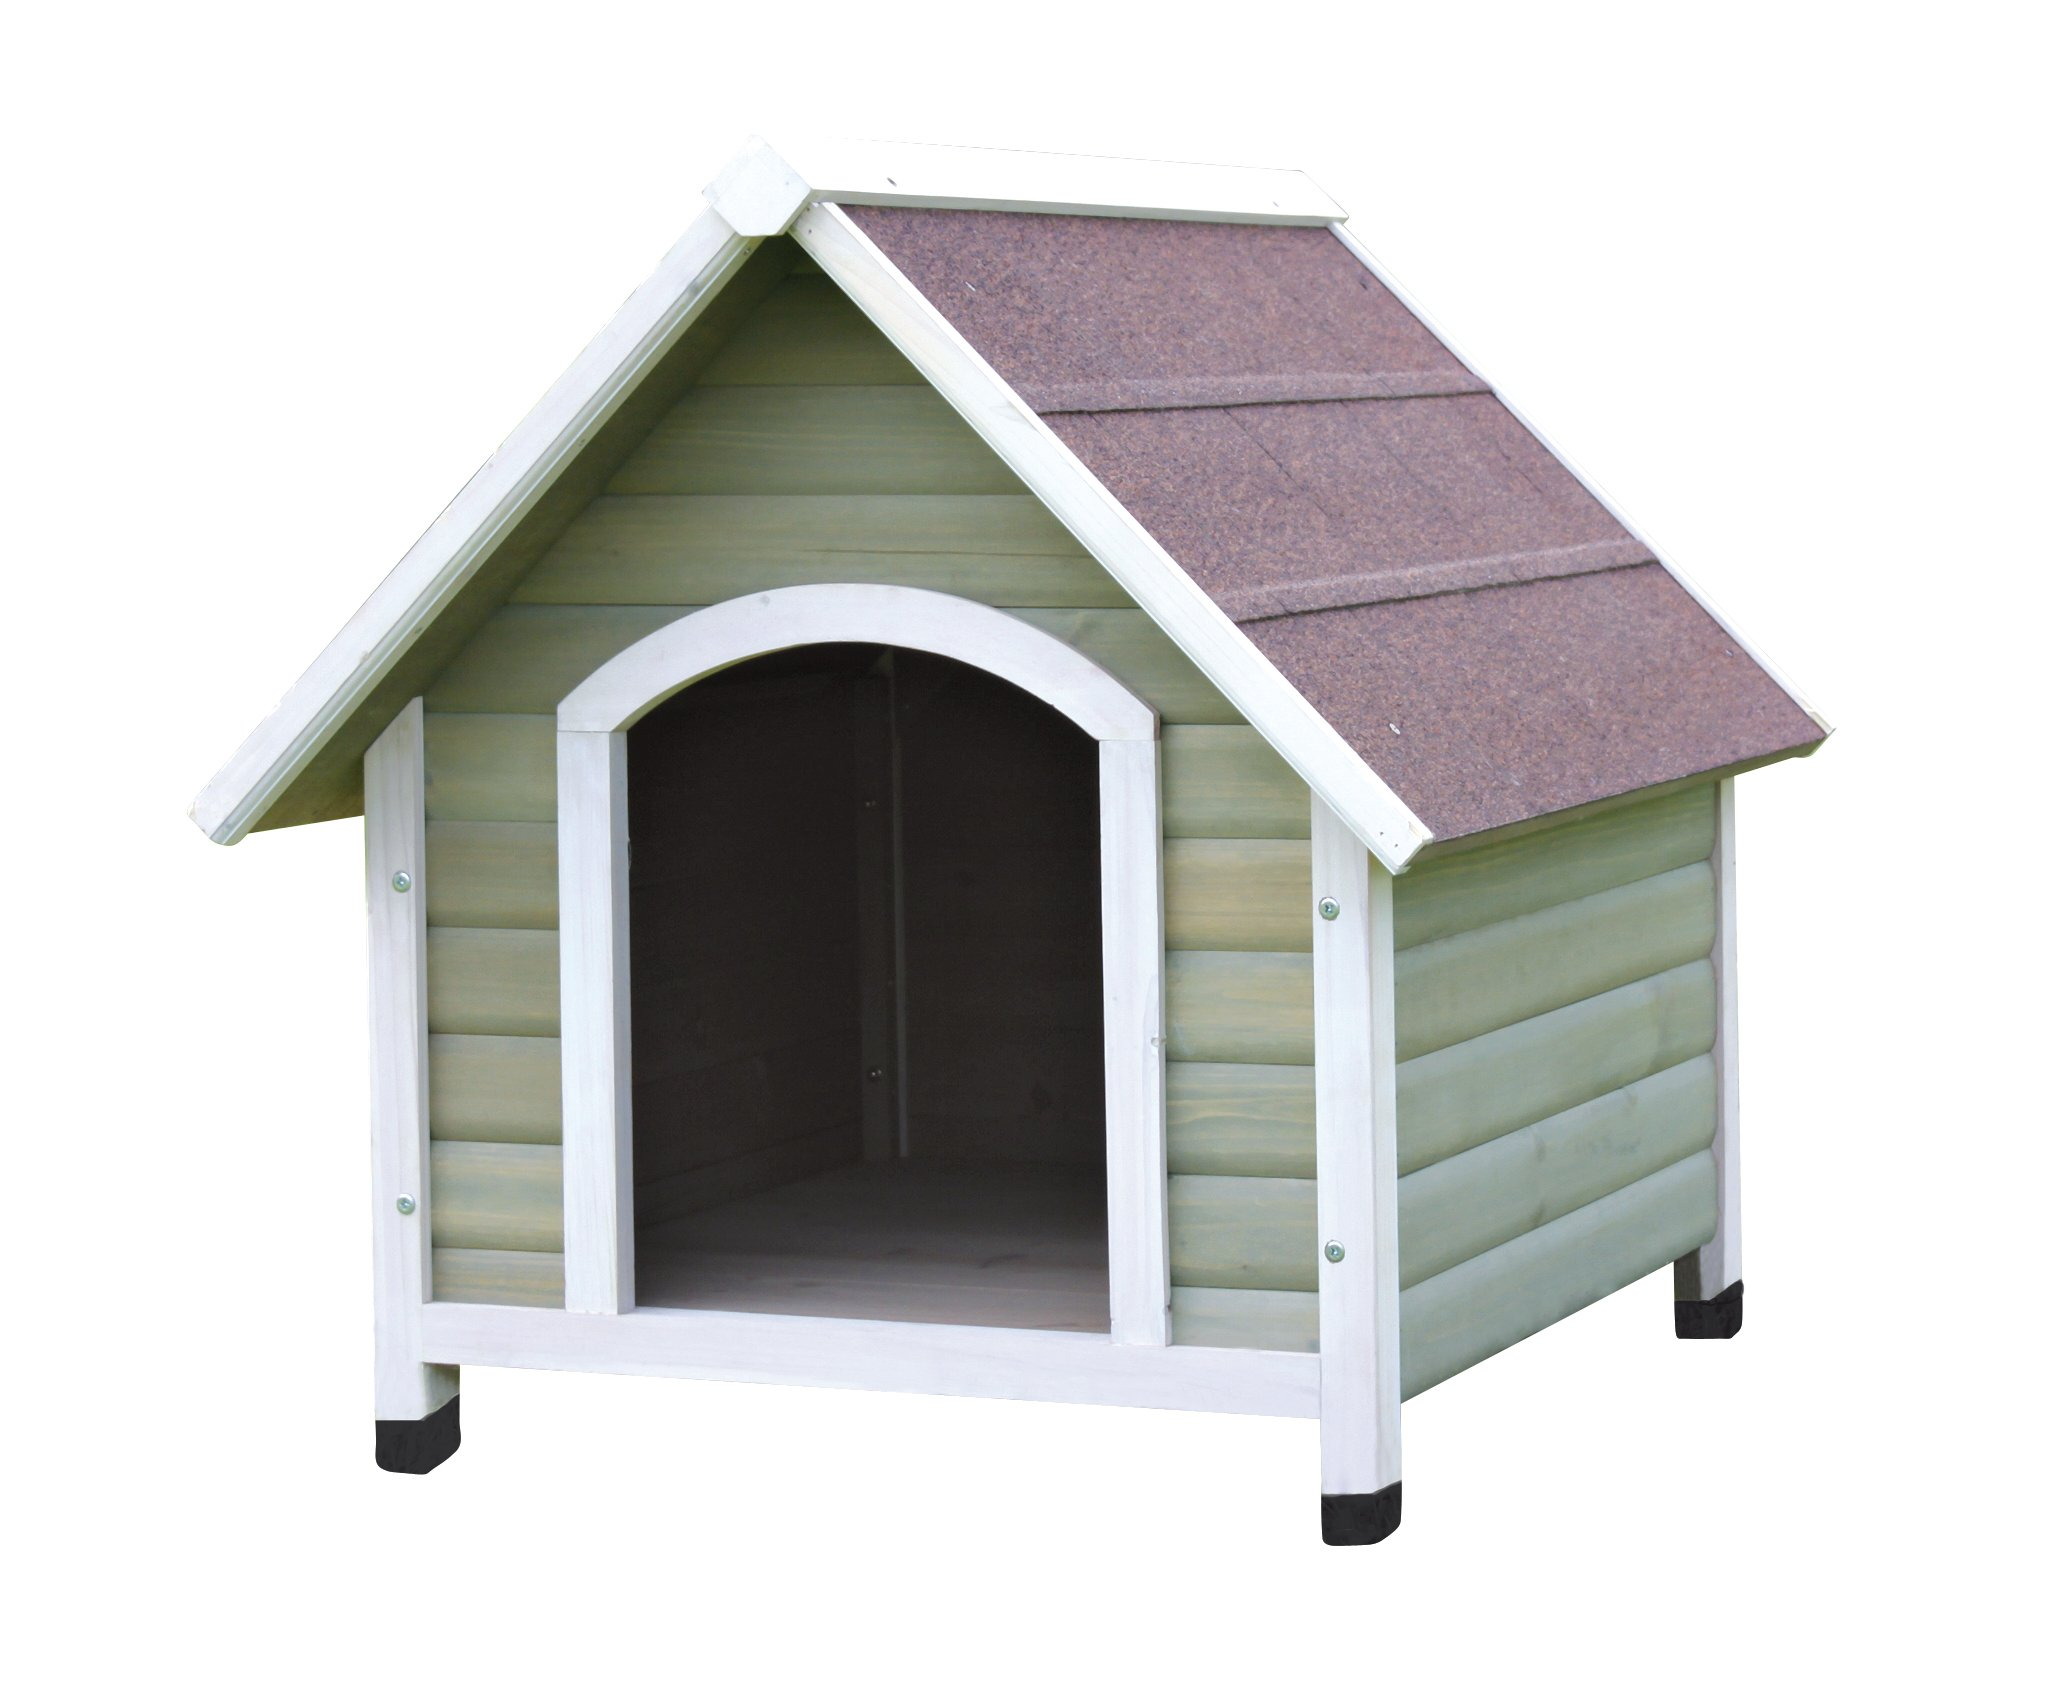 TRIXIE Pet Products Nantucket Dog House, Medium, Gray/White